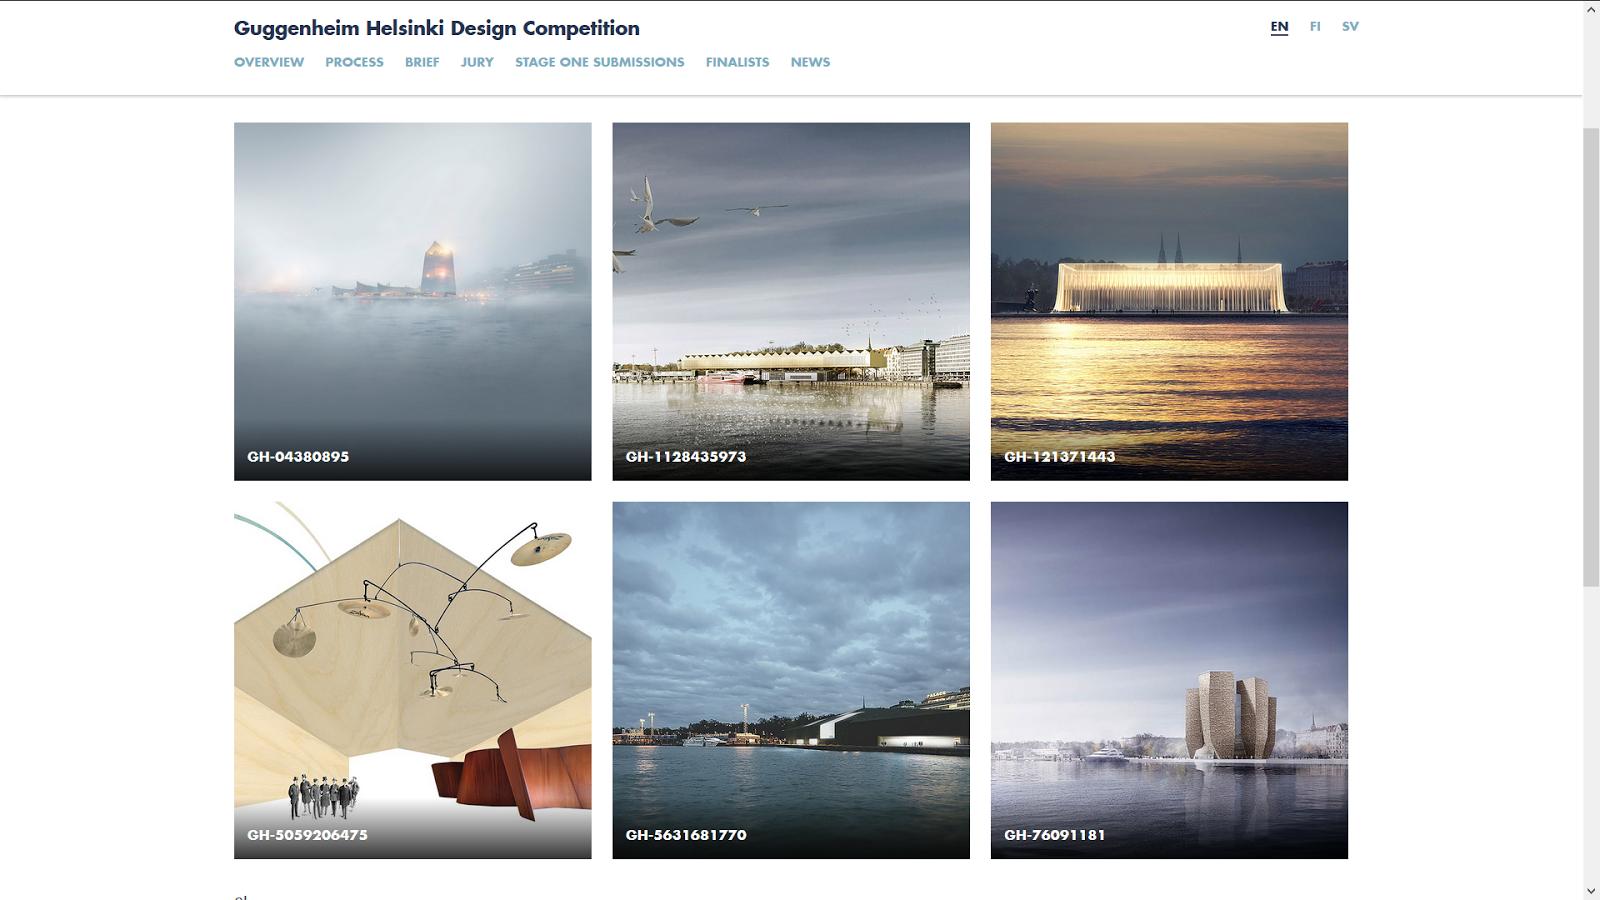 http://designguggenheimhelsinki.org/finalists/